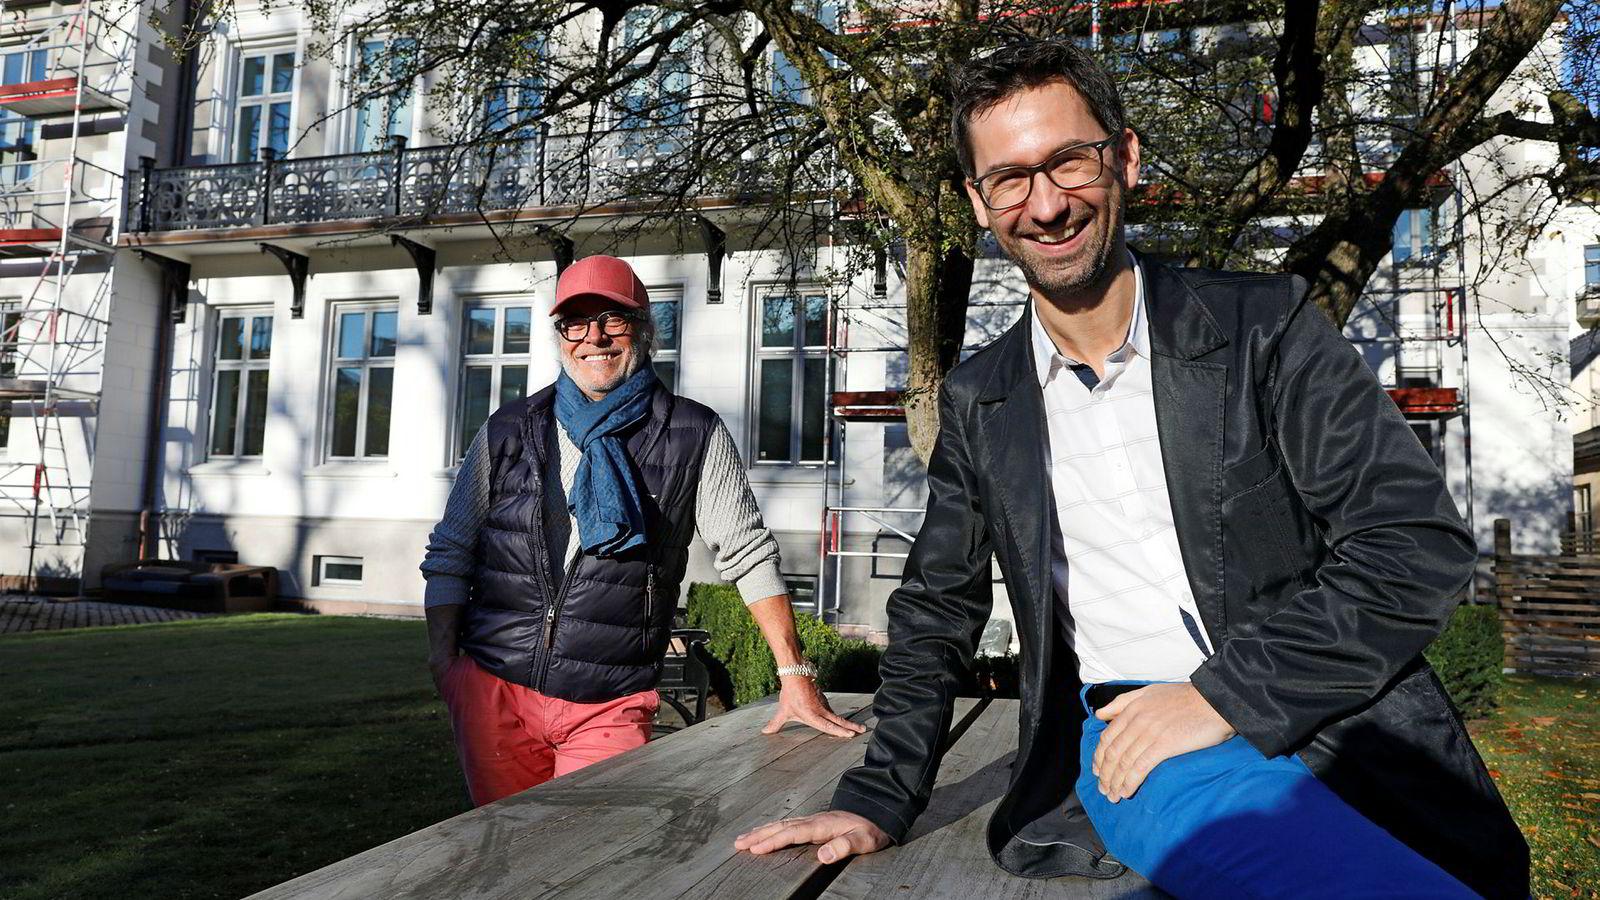 Åsmund Johan Mandal (til venstre) har selv startet flere bedrifter, og er nå en ledende investor i Business Angel Network Norway, der heltidsengel Jørn Lein-Mathisen er daglig leder.